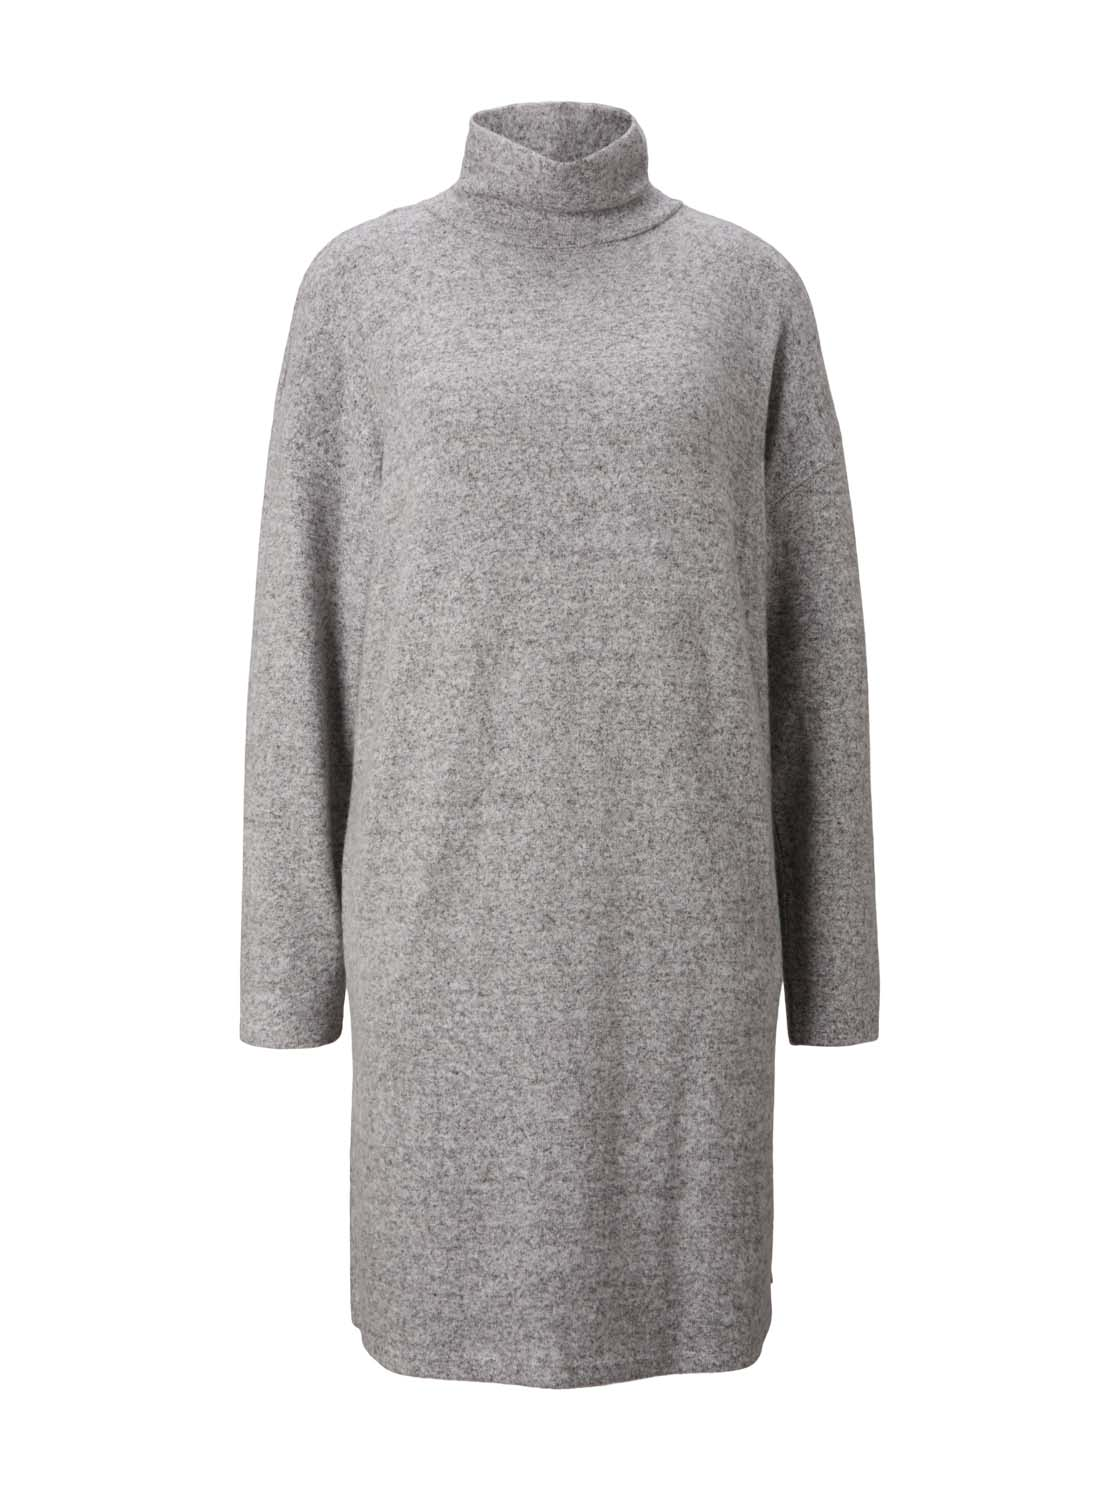 Tom Tailor Denim Long Pullover